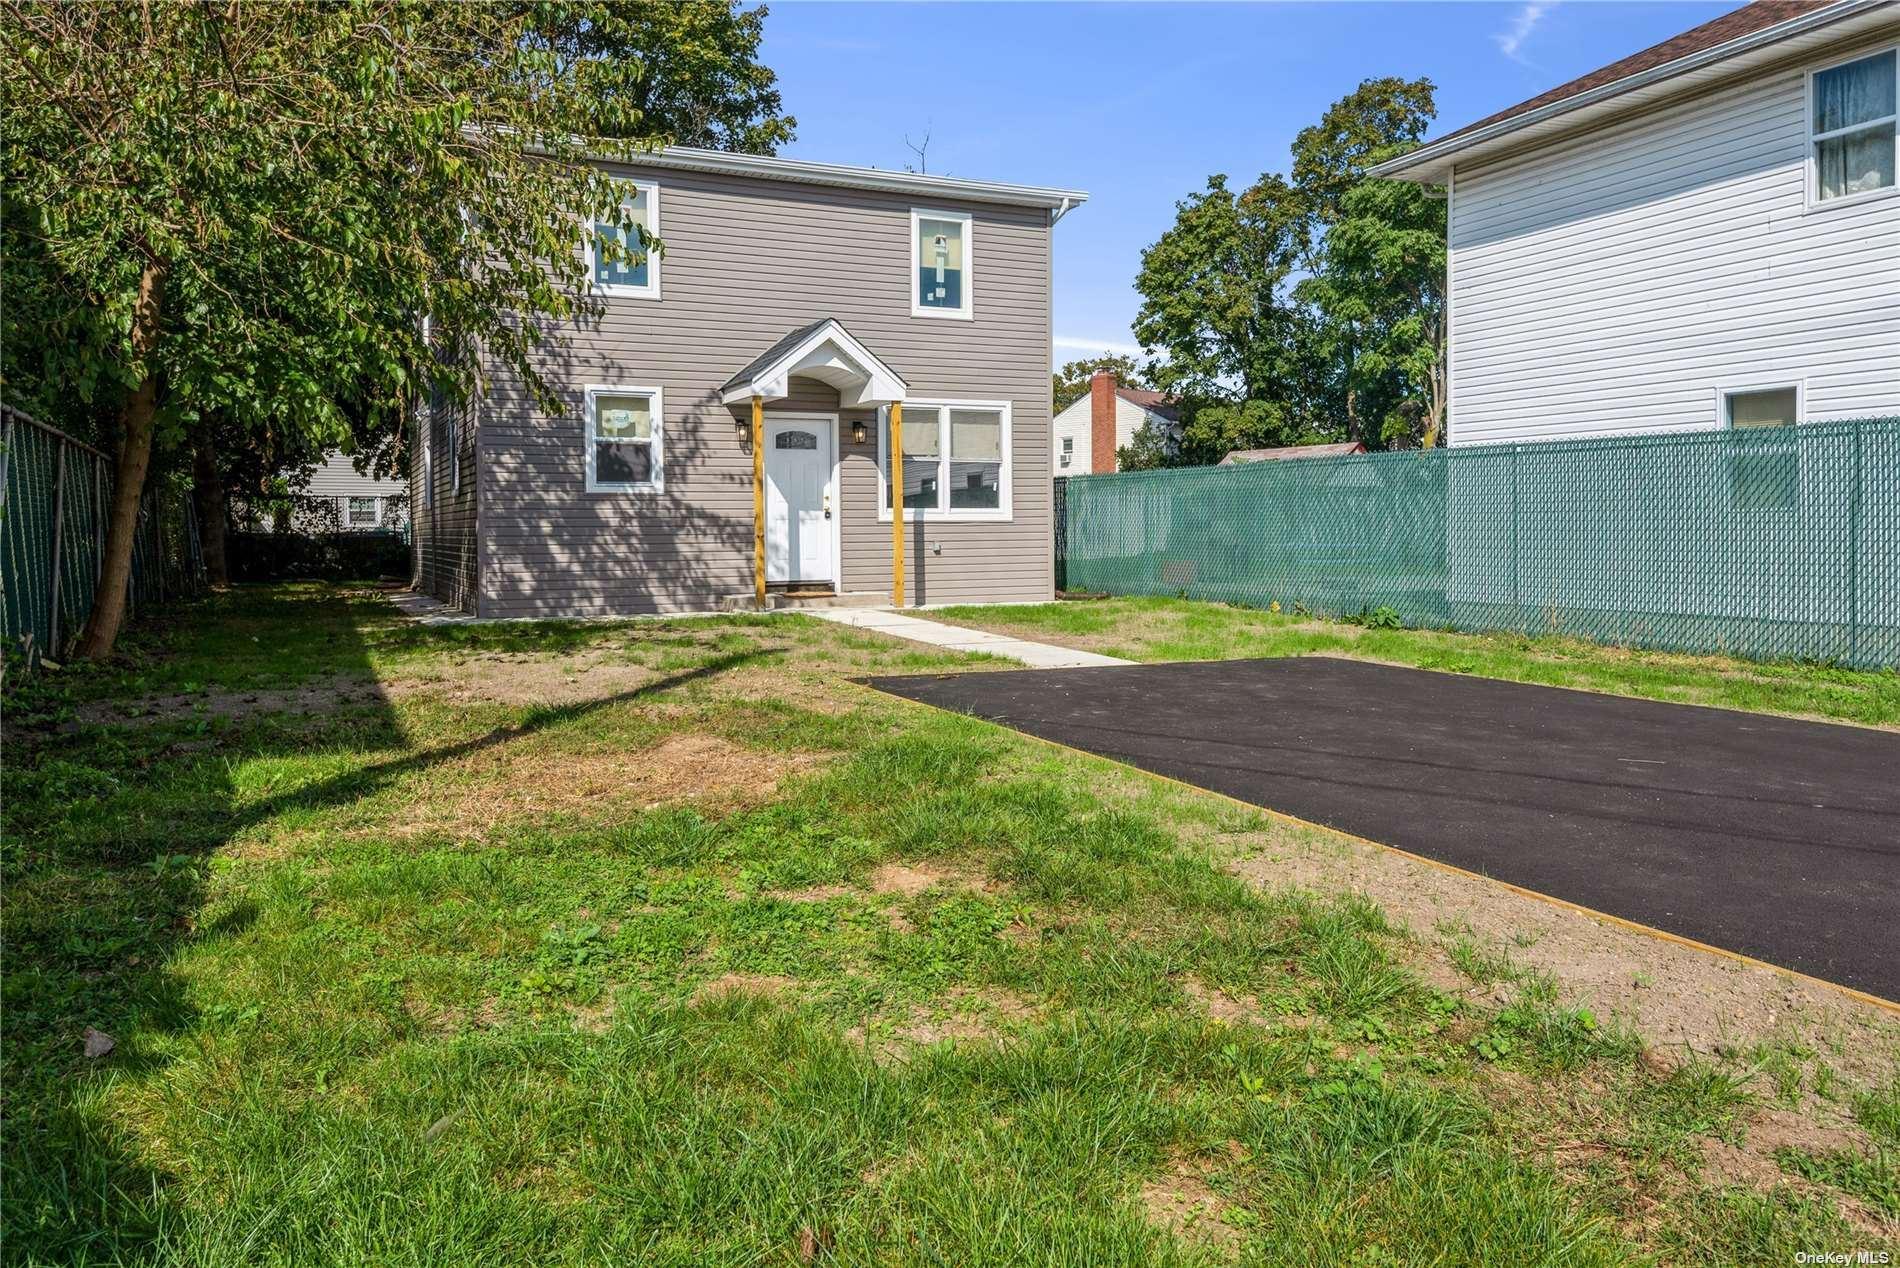 79 Robinwood Avenue, Hempstead, NY 11550 - MLS#: 3322567